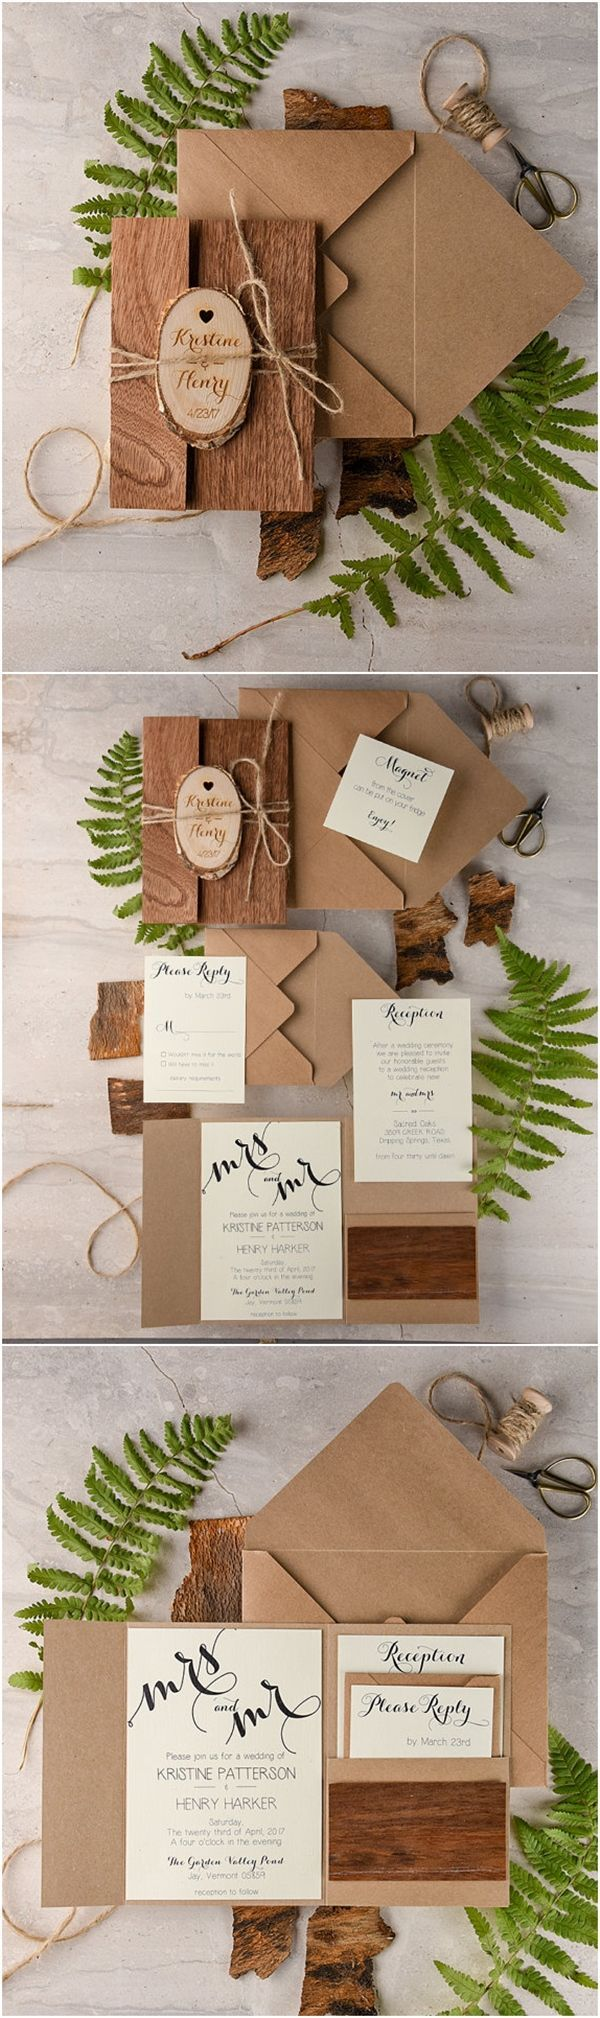 wood wedding invitations wood wedding invitations Recycled Eco Rustic Real Wood Wedding Invitations